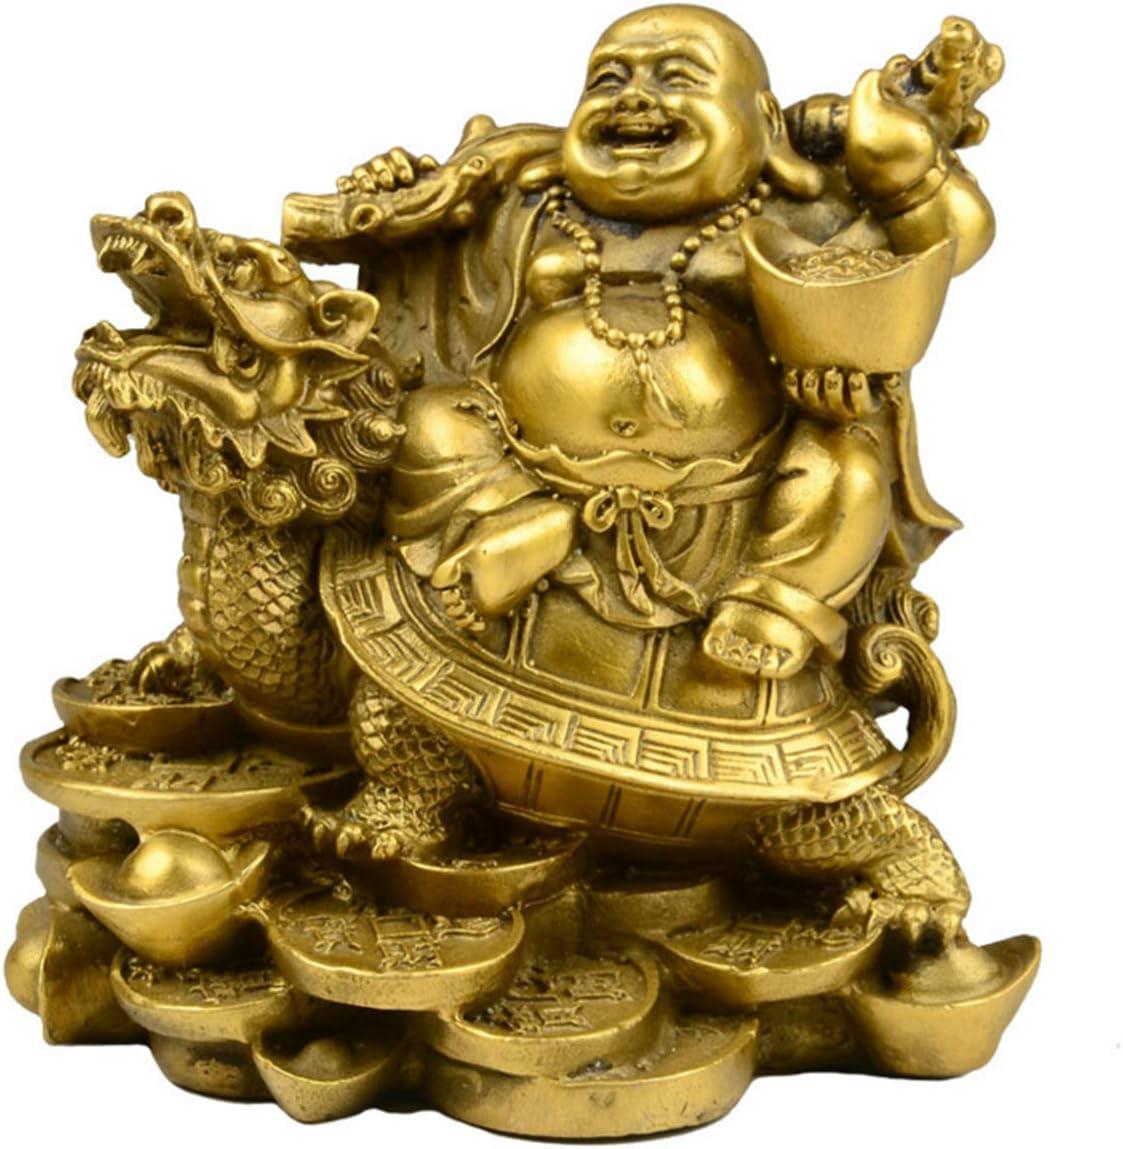 5 CM Chinese Bronze auspicious glossy ganoderma Ganodorma Turbo snail sculpture